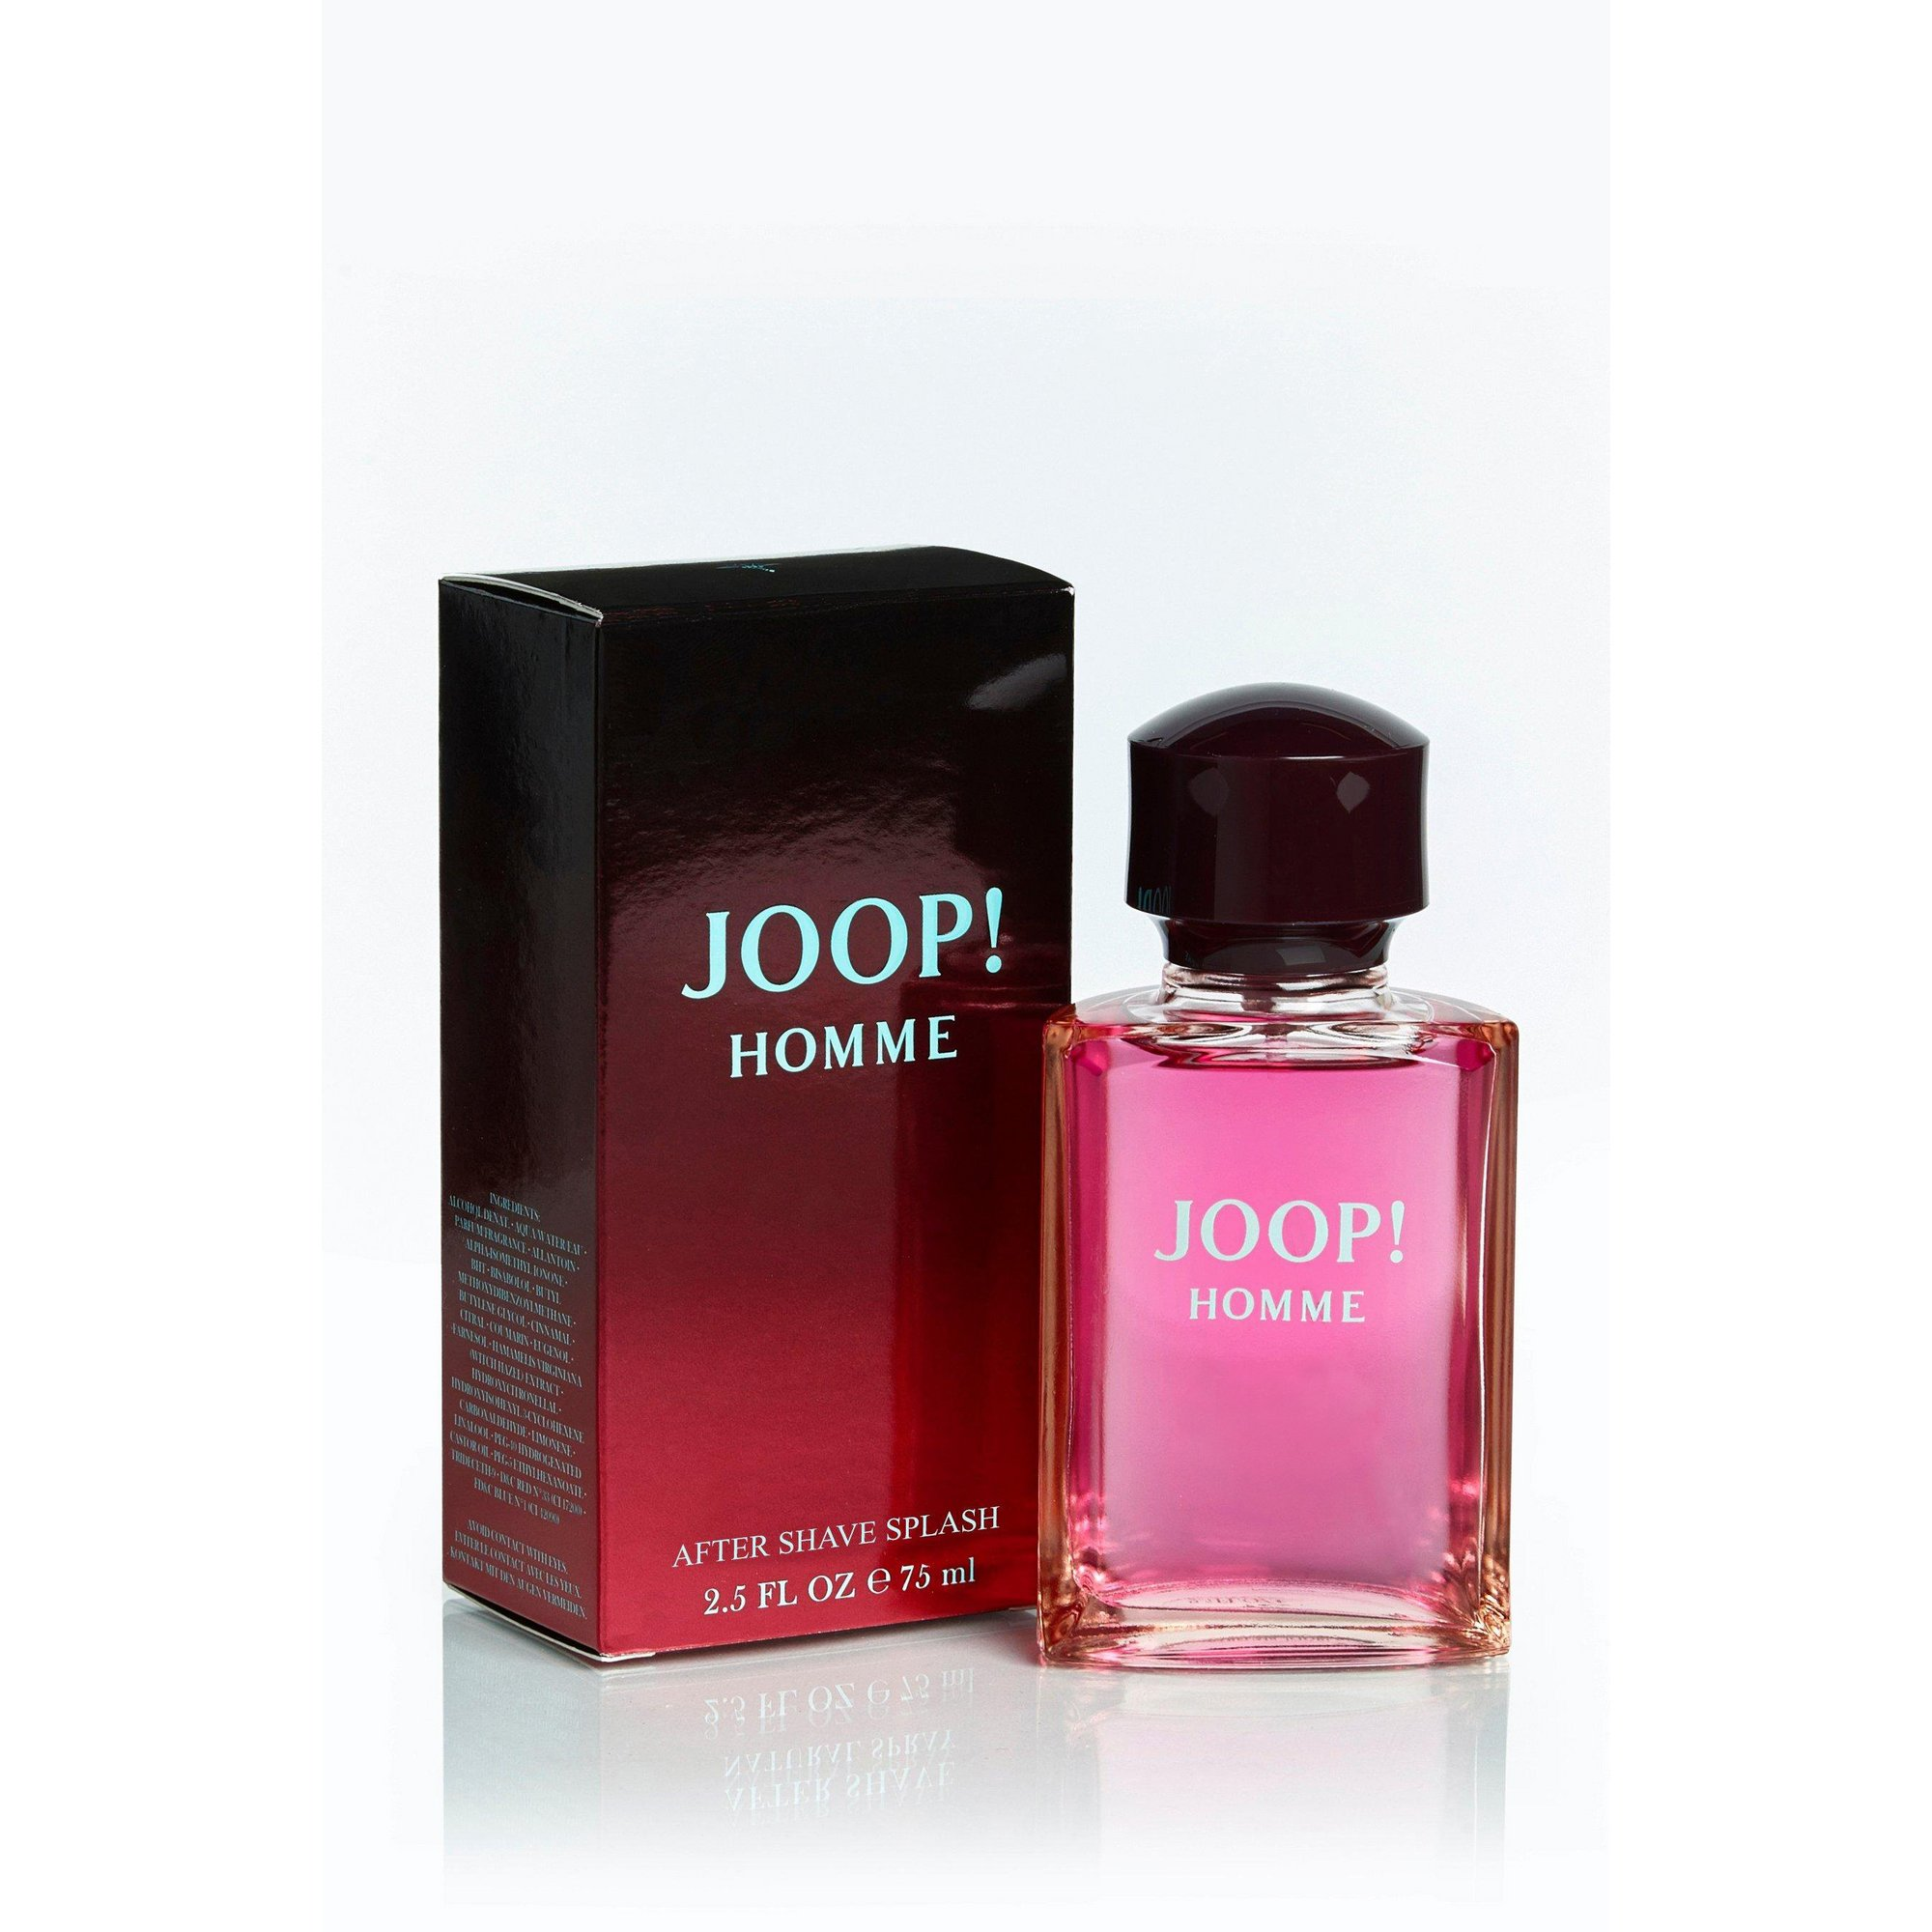 Image of Joop! Homme 75ml Aftershave Splash